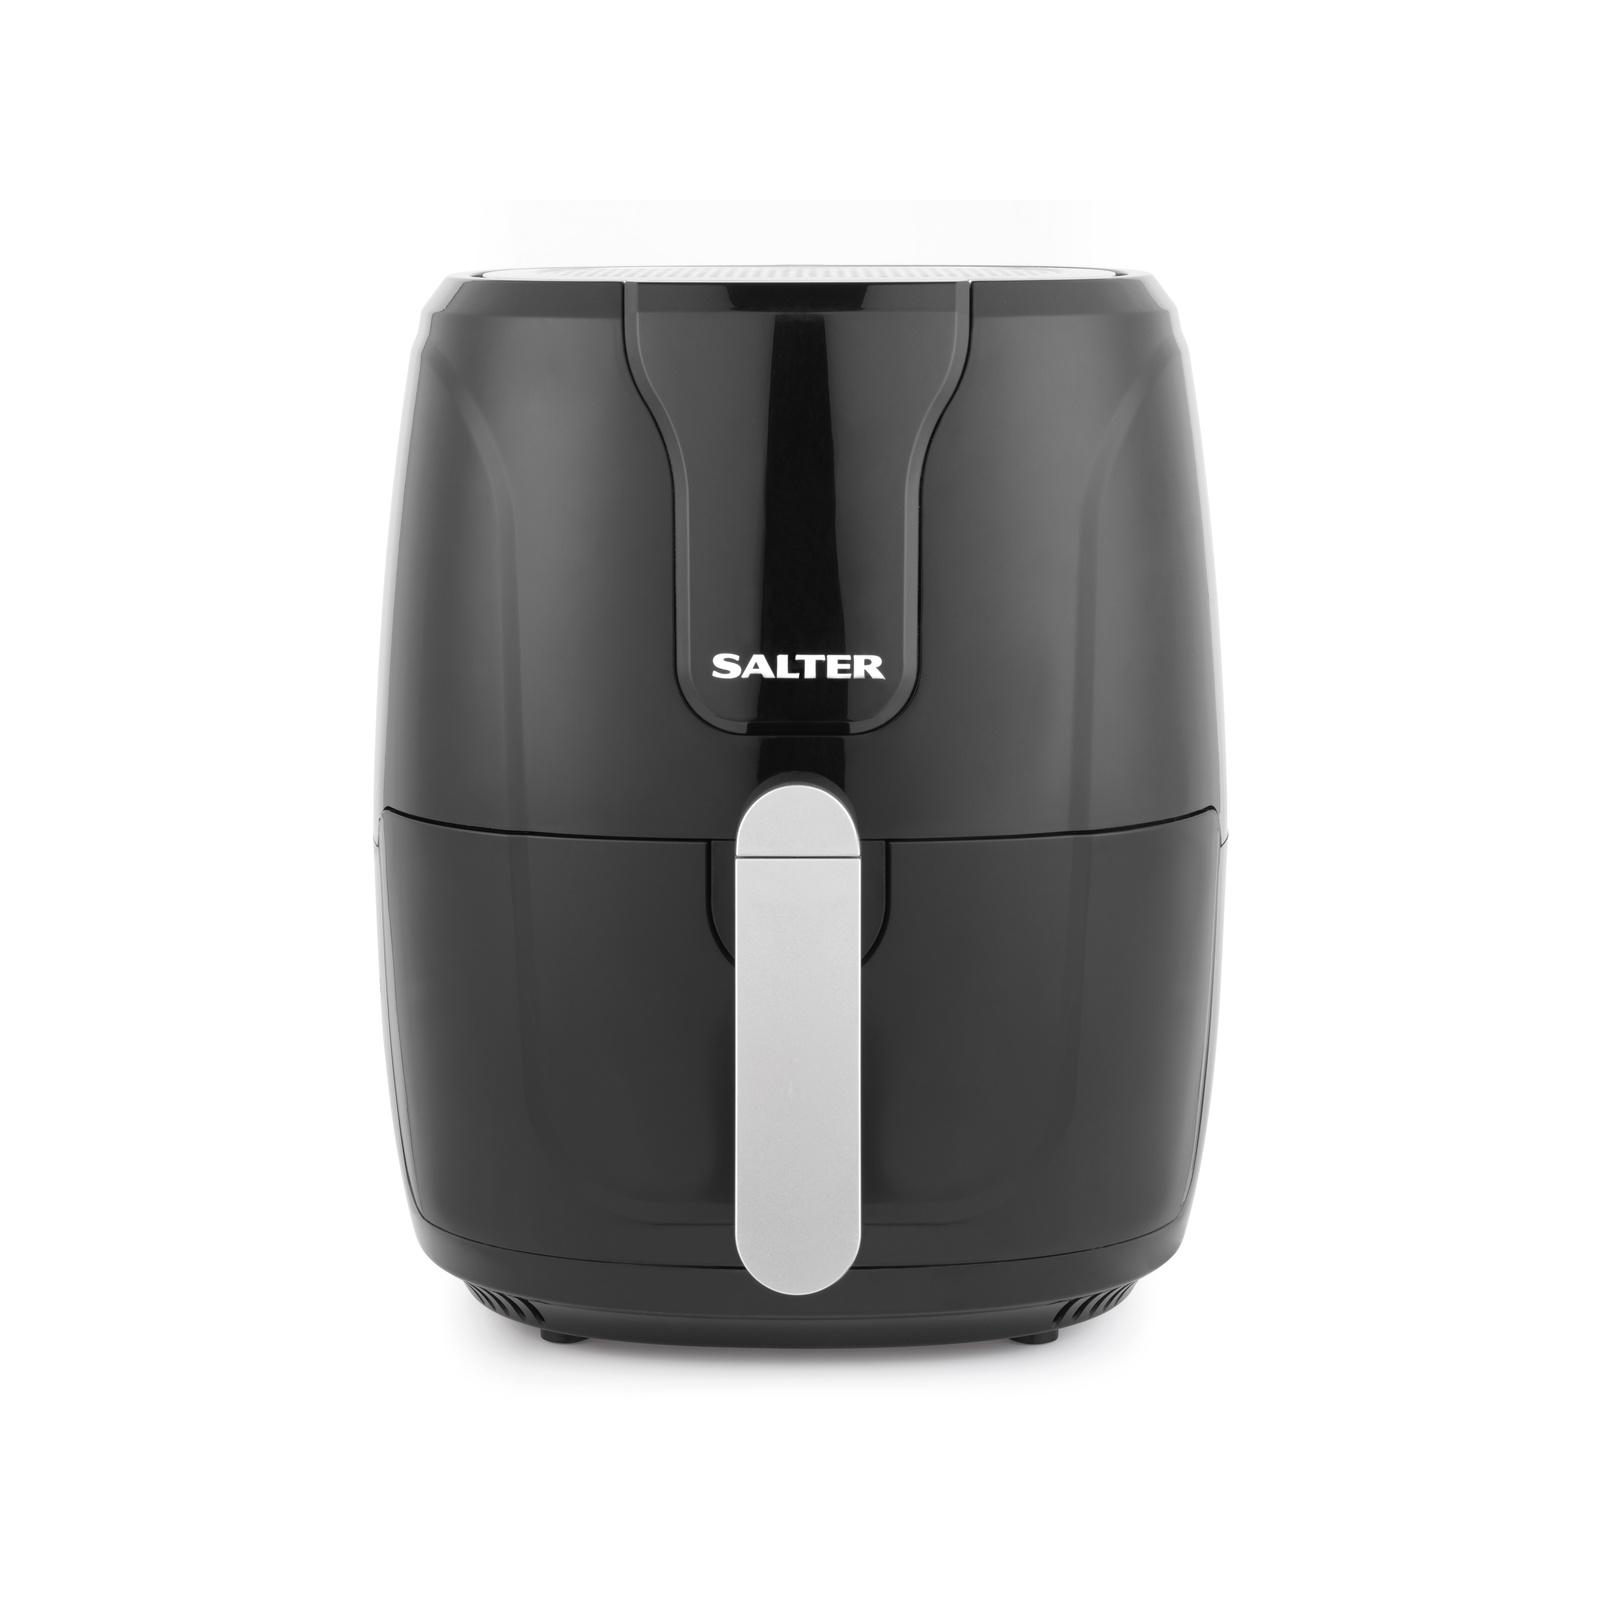 Salter EK3960 Go Healthy Air Fryer 4.5 Litre 1300W  Digital Temperature Control & 30 Minute Timer Removable Non-Stick Basket